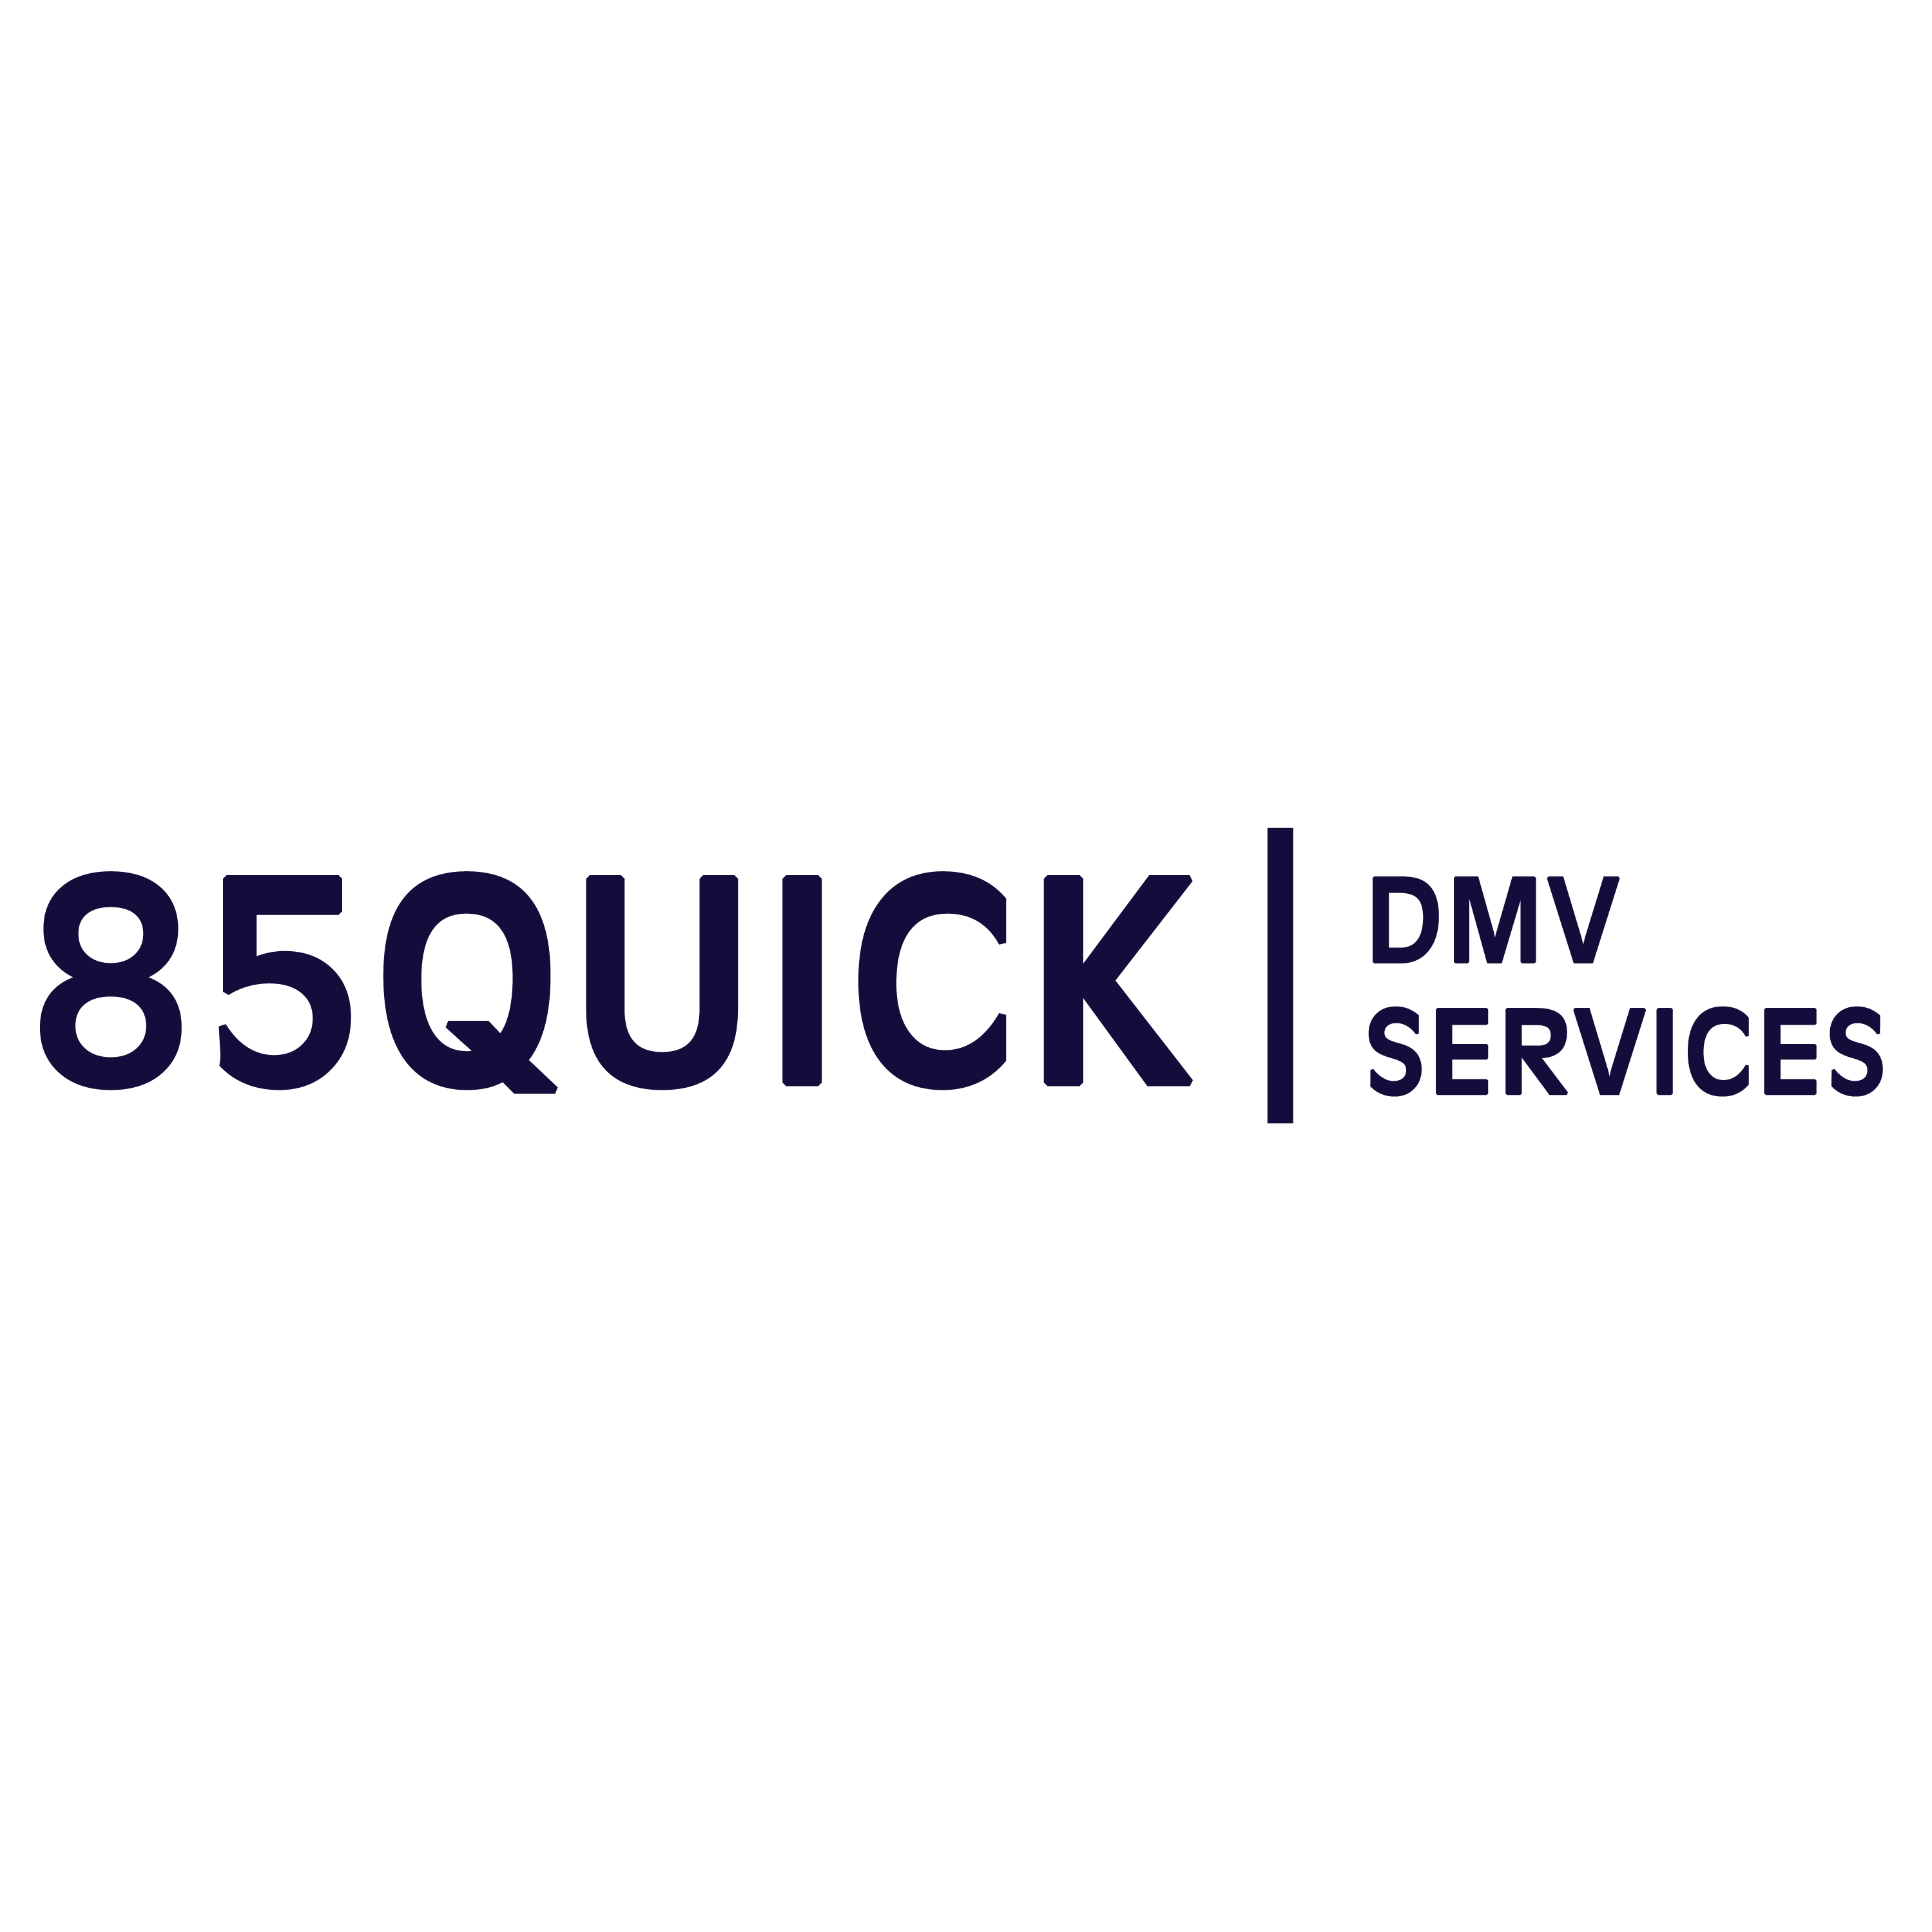 85Quick DMV Services - Locust Valley, NY - General Auto Repair & Service